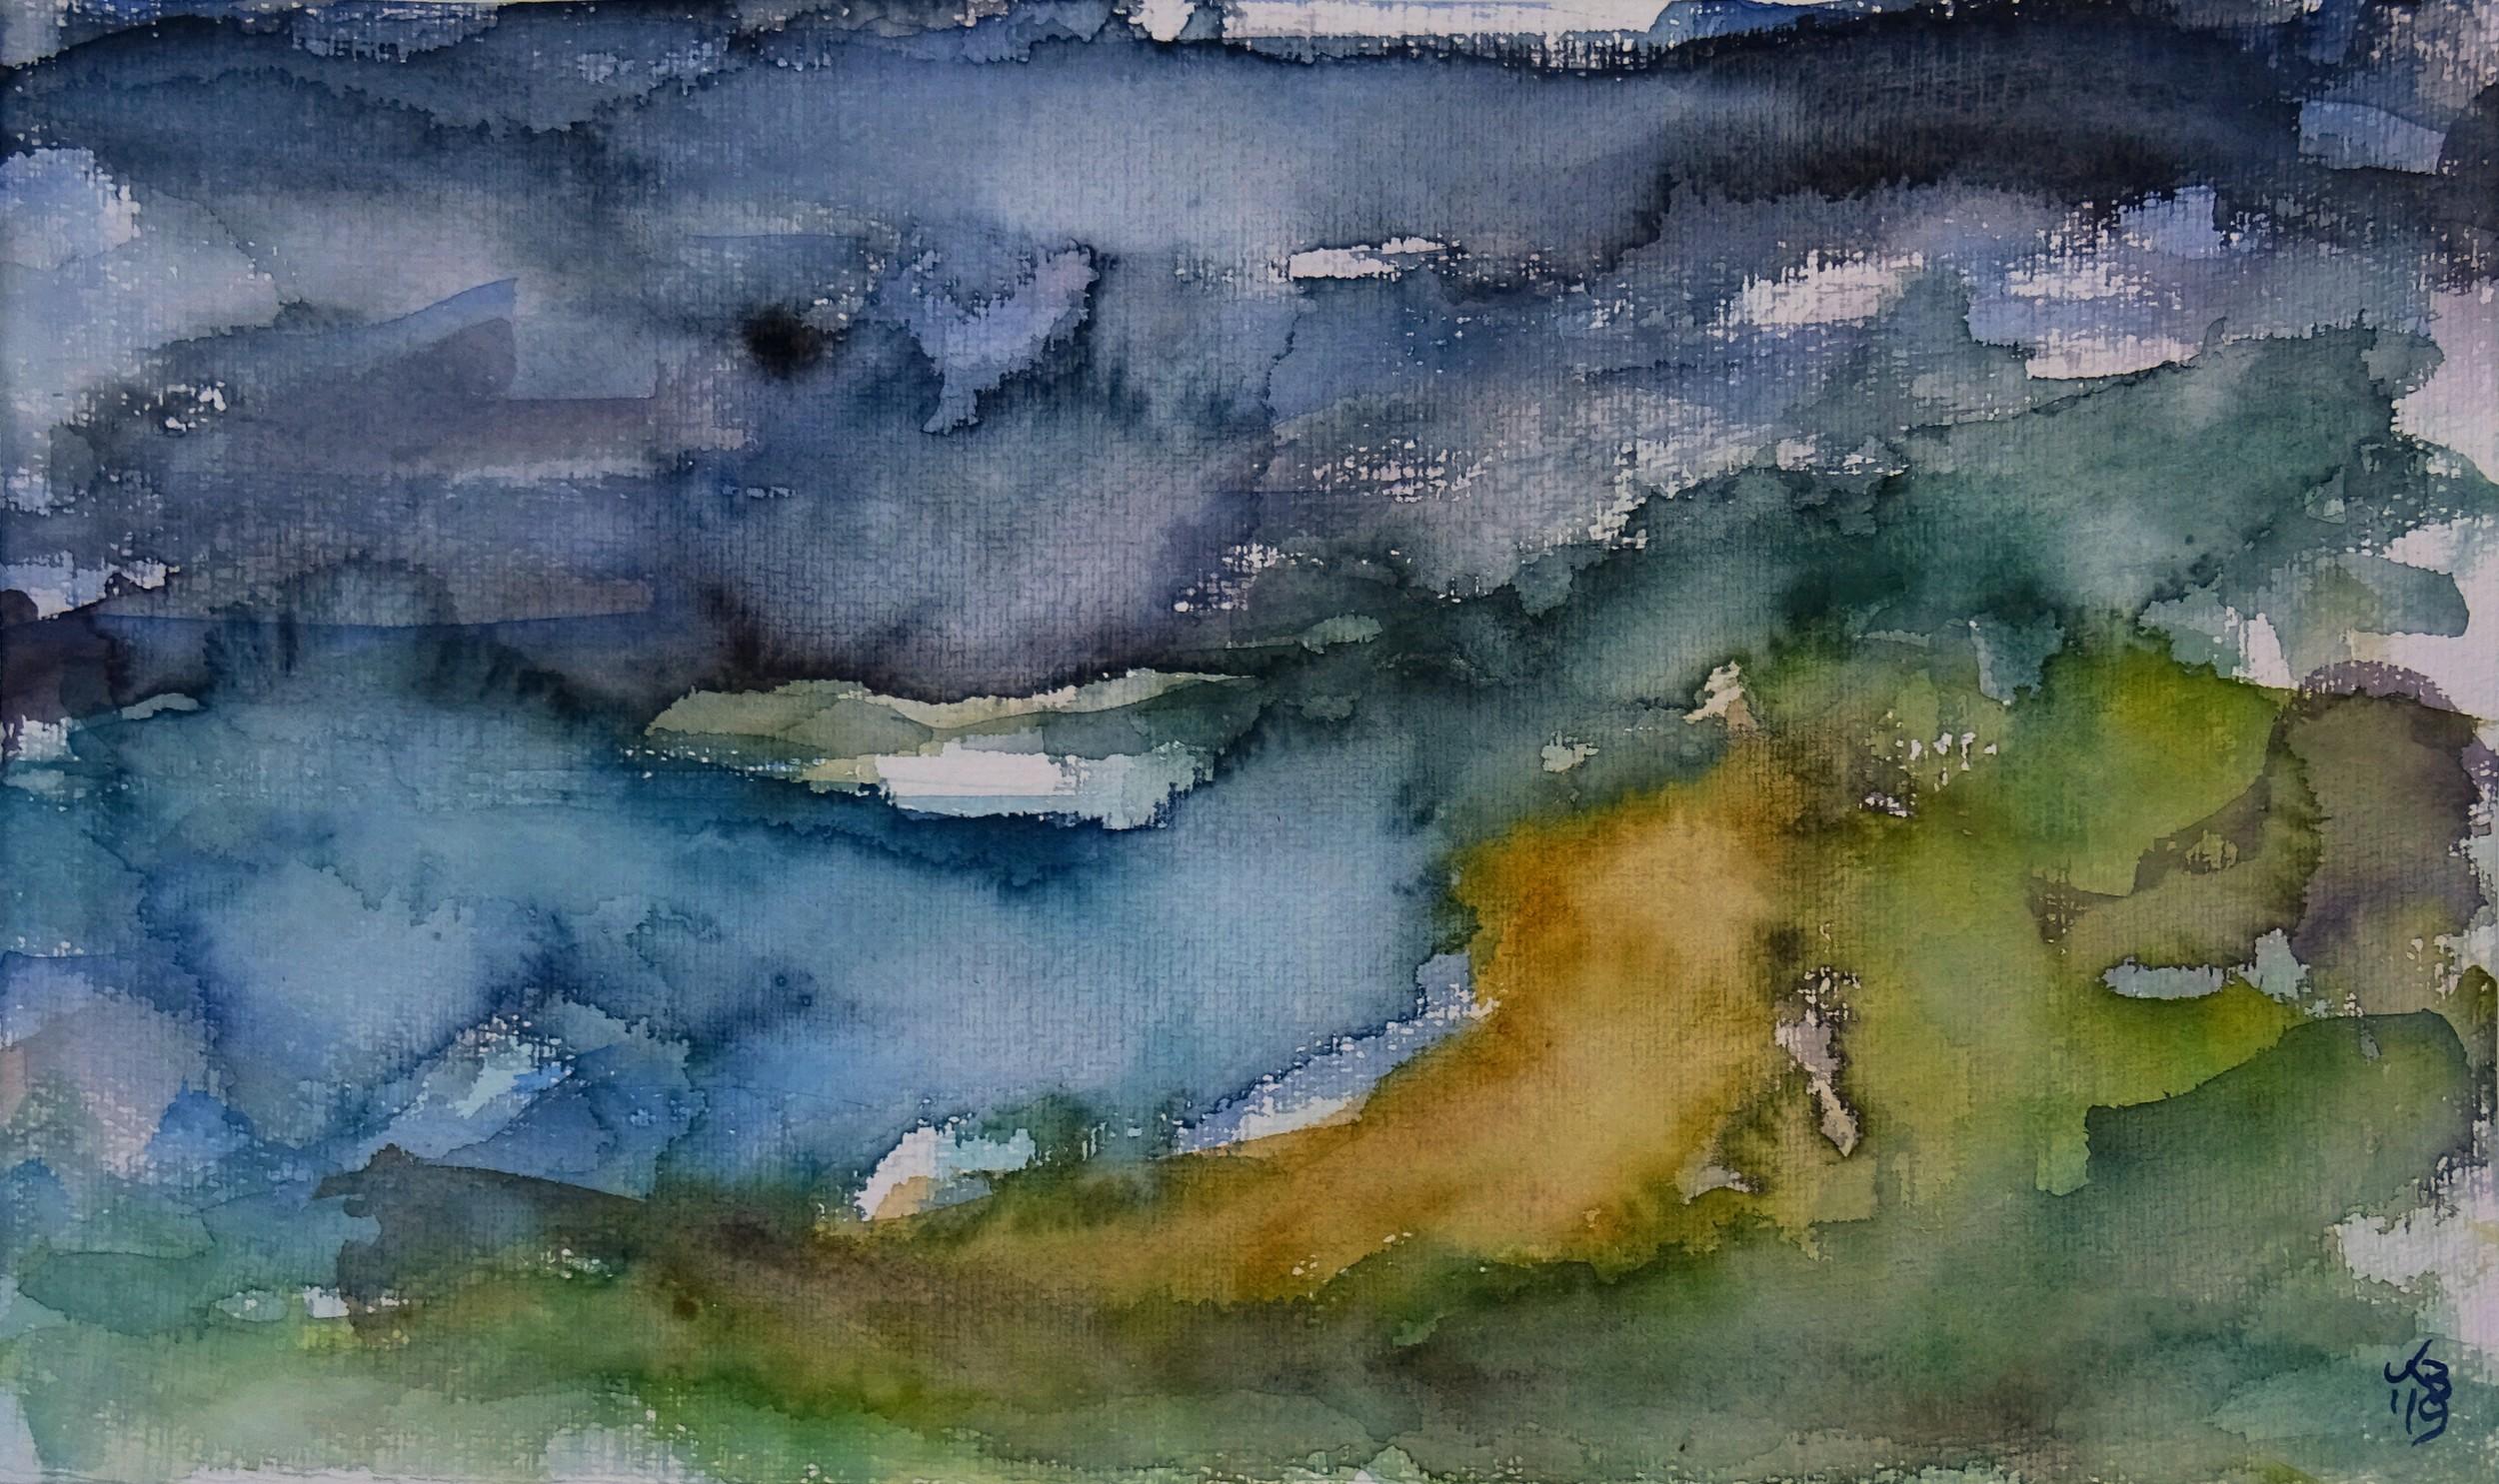 19-01-04_outer_hebrides_eriskay_coilleag_a_phrionnsa_Watercolour_50_x_30_cm_©2019_by_Klaus_Bölling.jpg